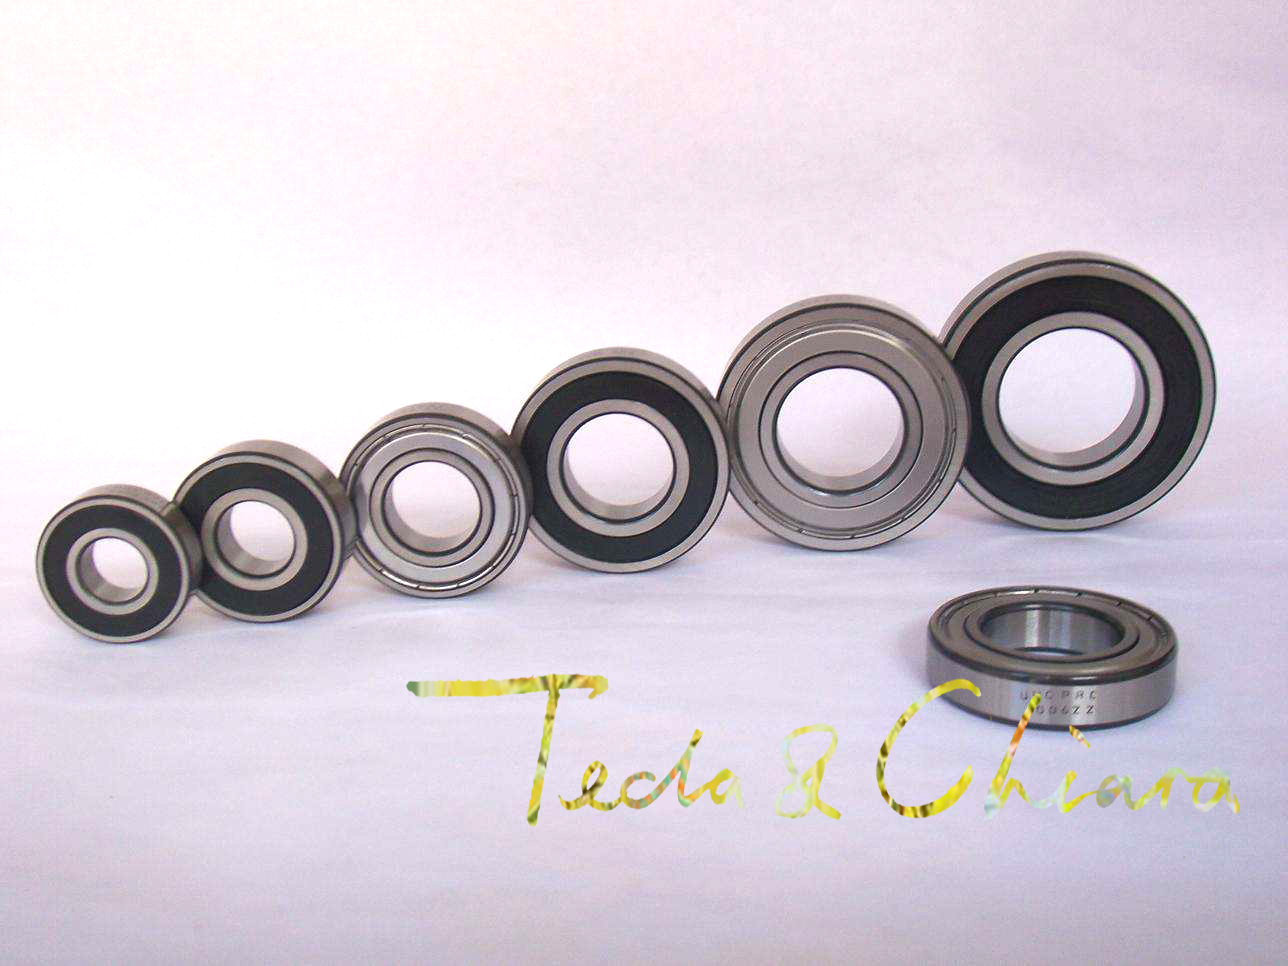 603 603ZZ 603RS 603-2Z 603Z 603-2RS ZZ RS RZ 2RZ Deep Groove Ball Bearings 3 x 9 x 5mm High Quality eurosvet 603 2